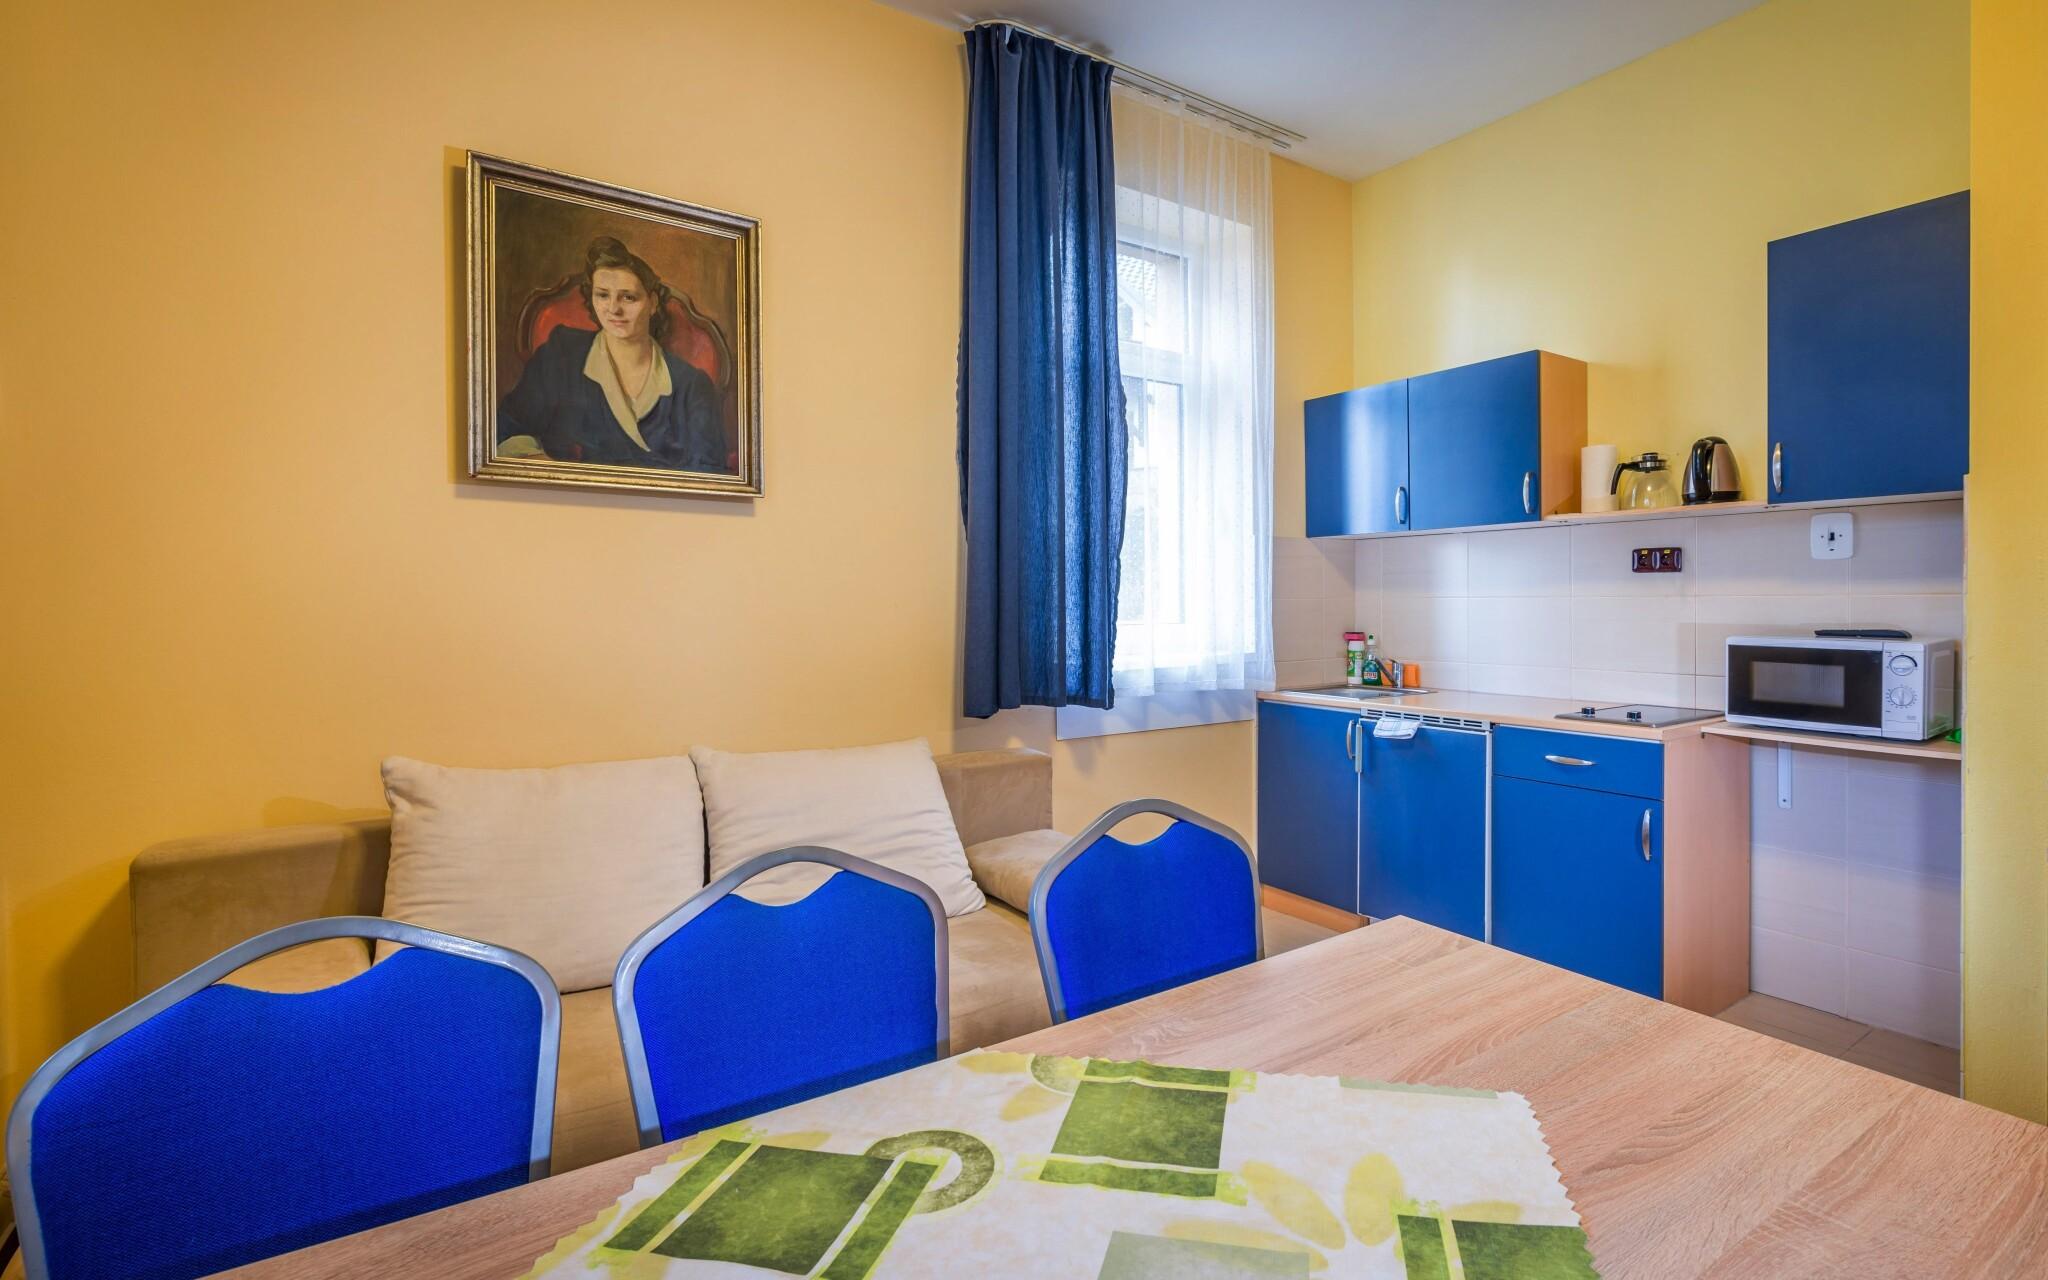 Bezbariérový apartmán až pro 5 osob, kuchyňka